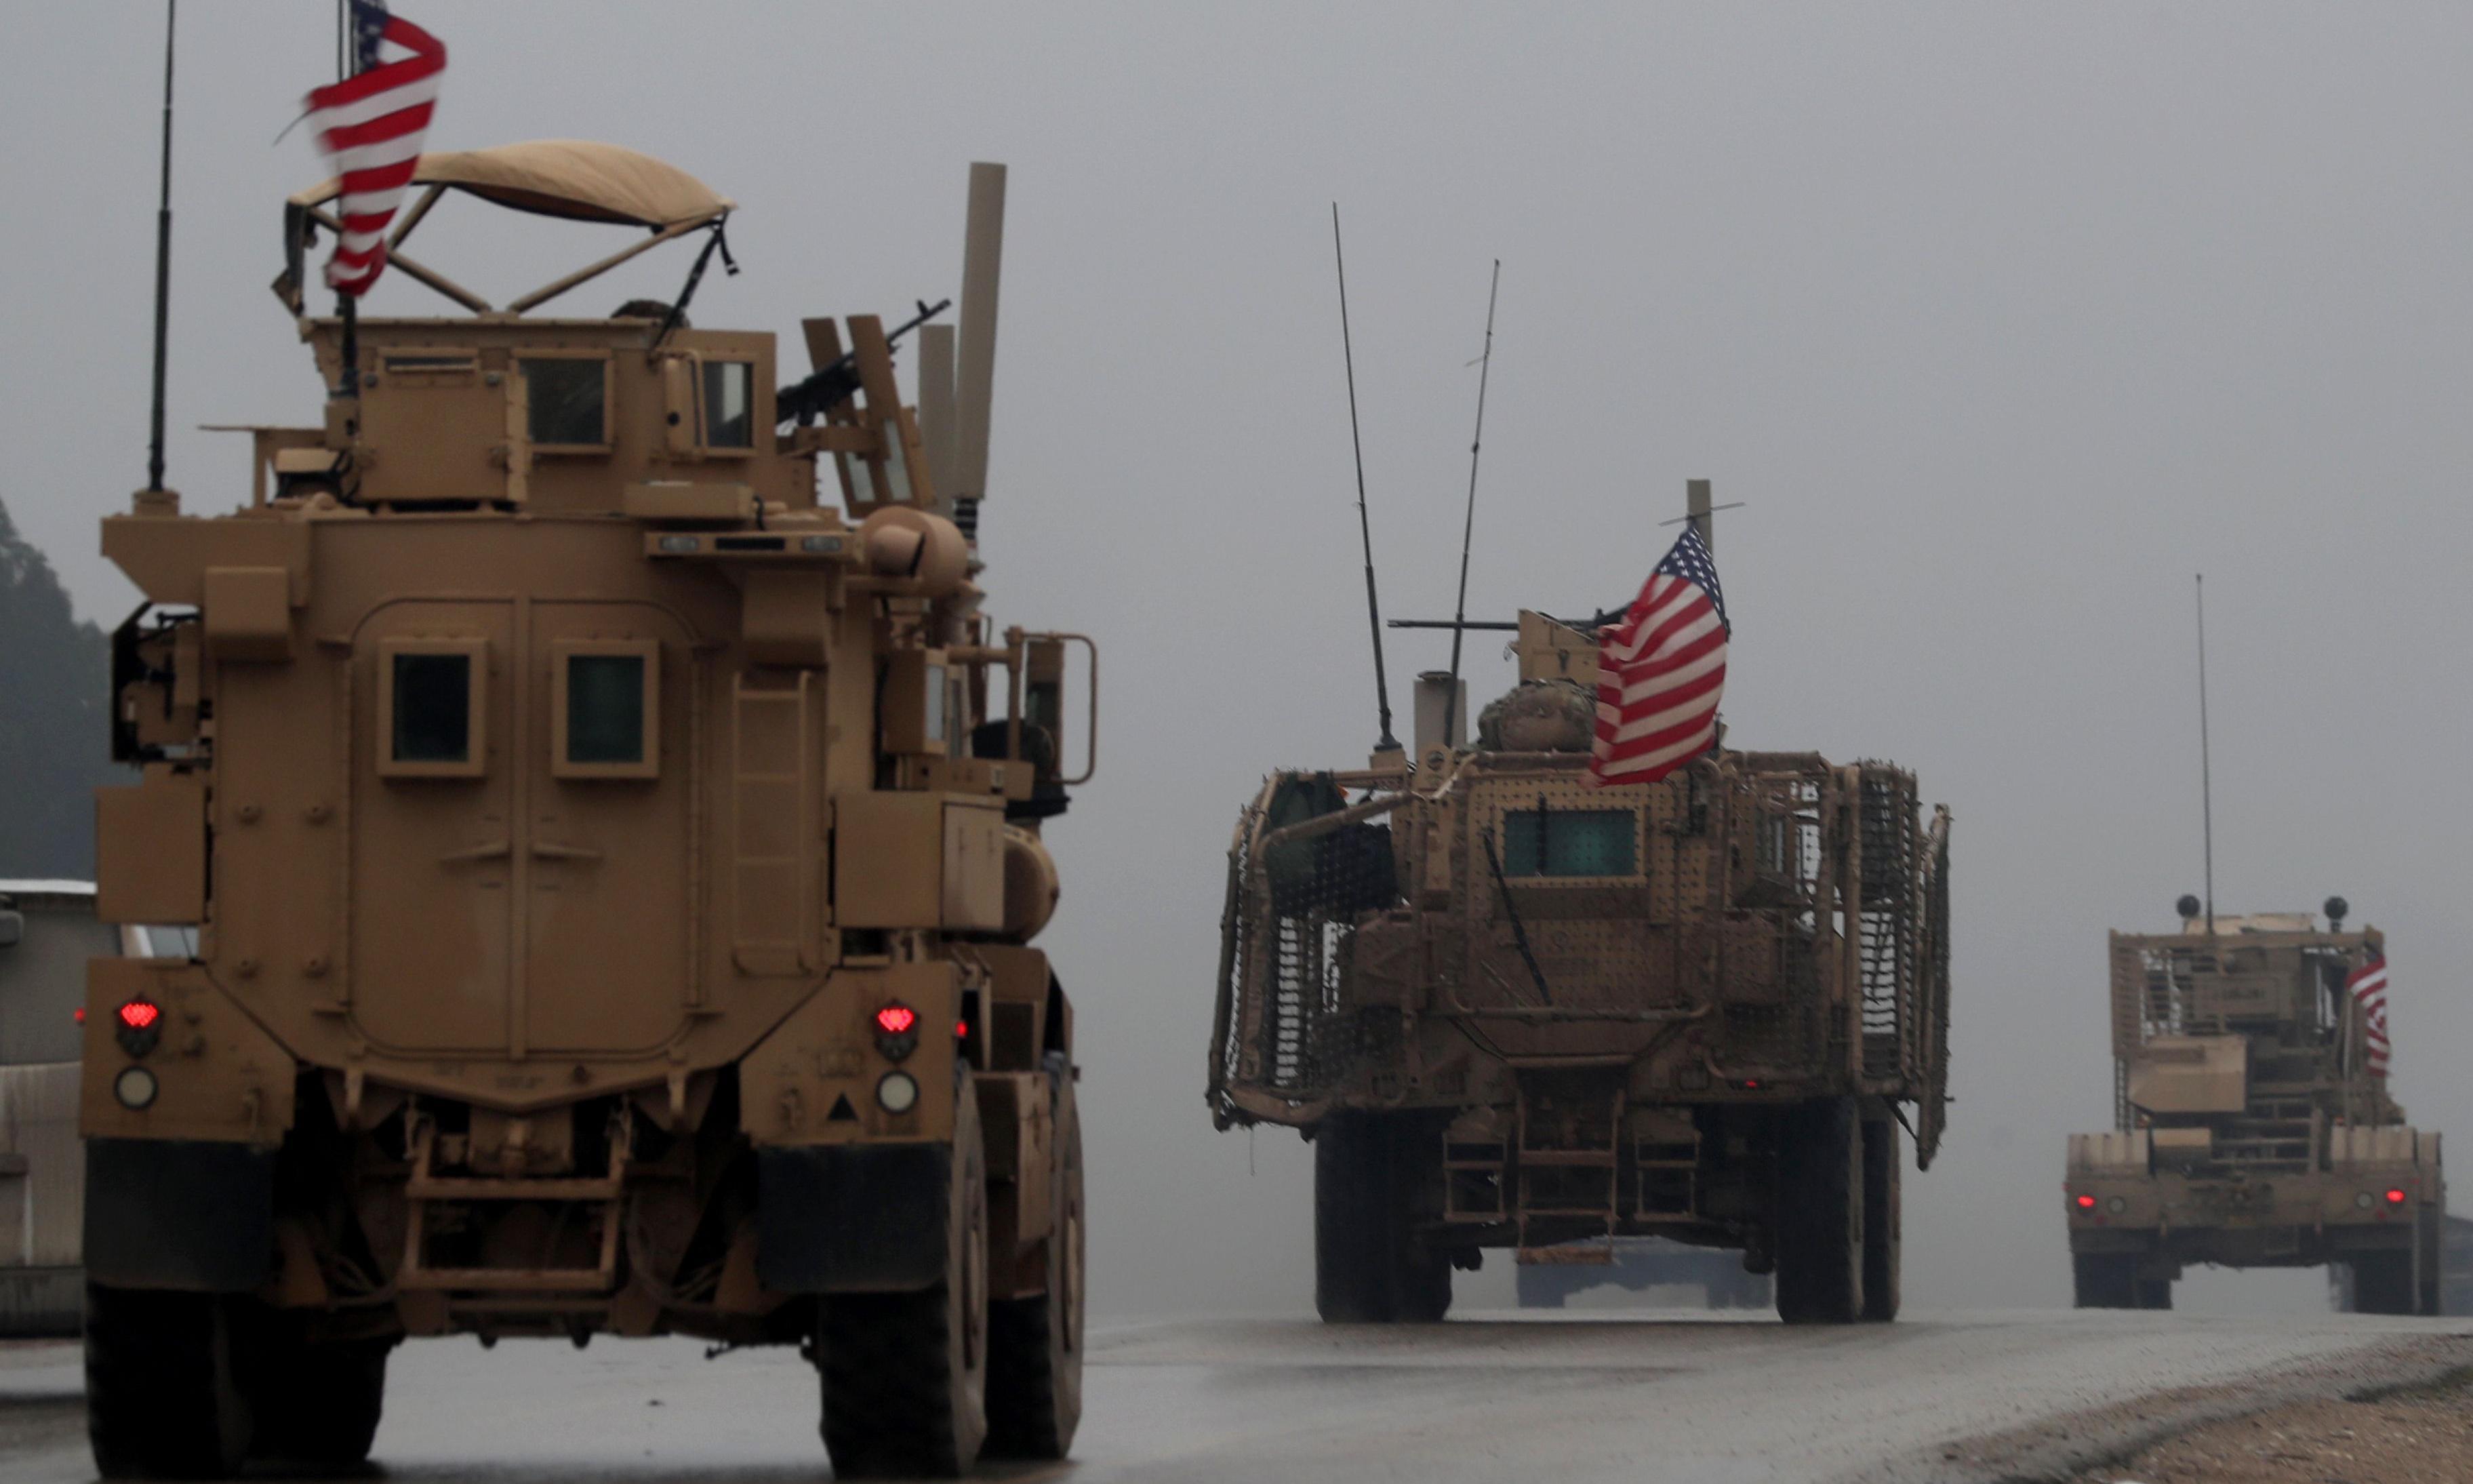 Trump says he will 'devastate Turkey economically' if it attacks Kurds